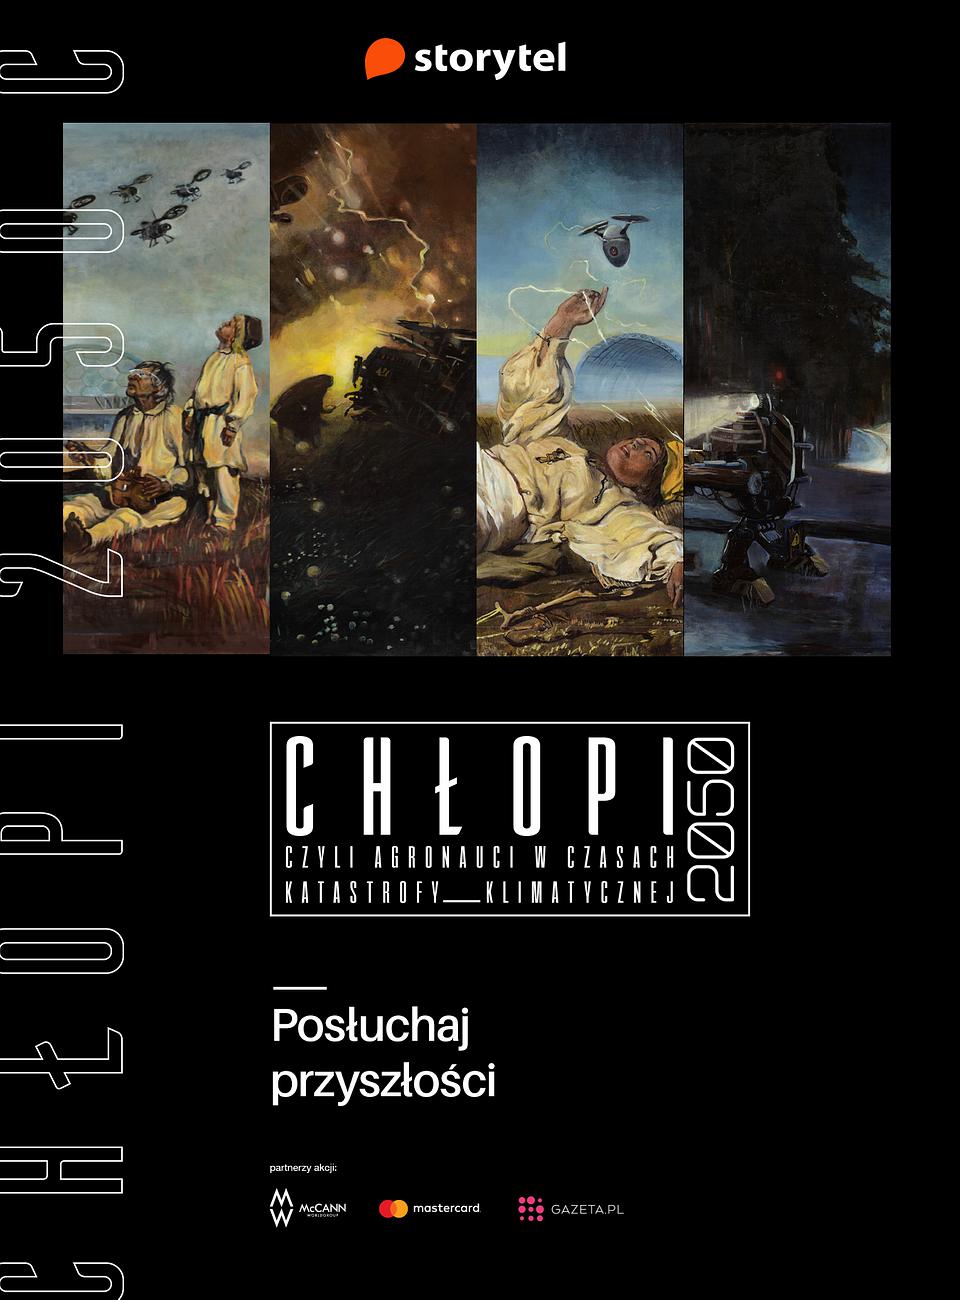 Grafika Chłopi 2050 1080x1920.png